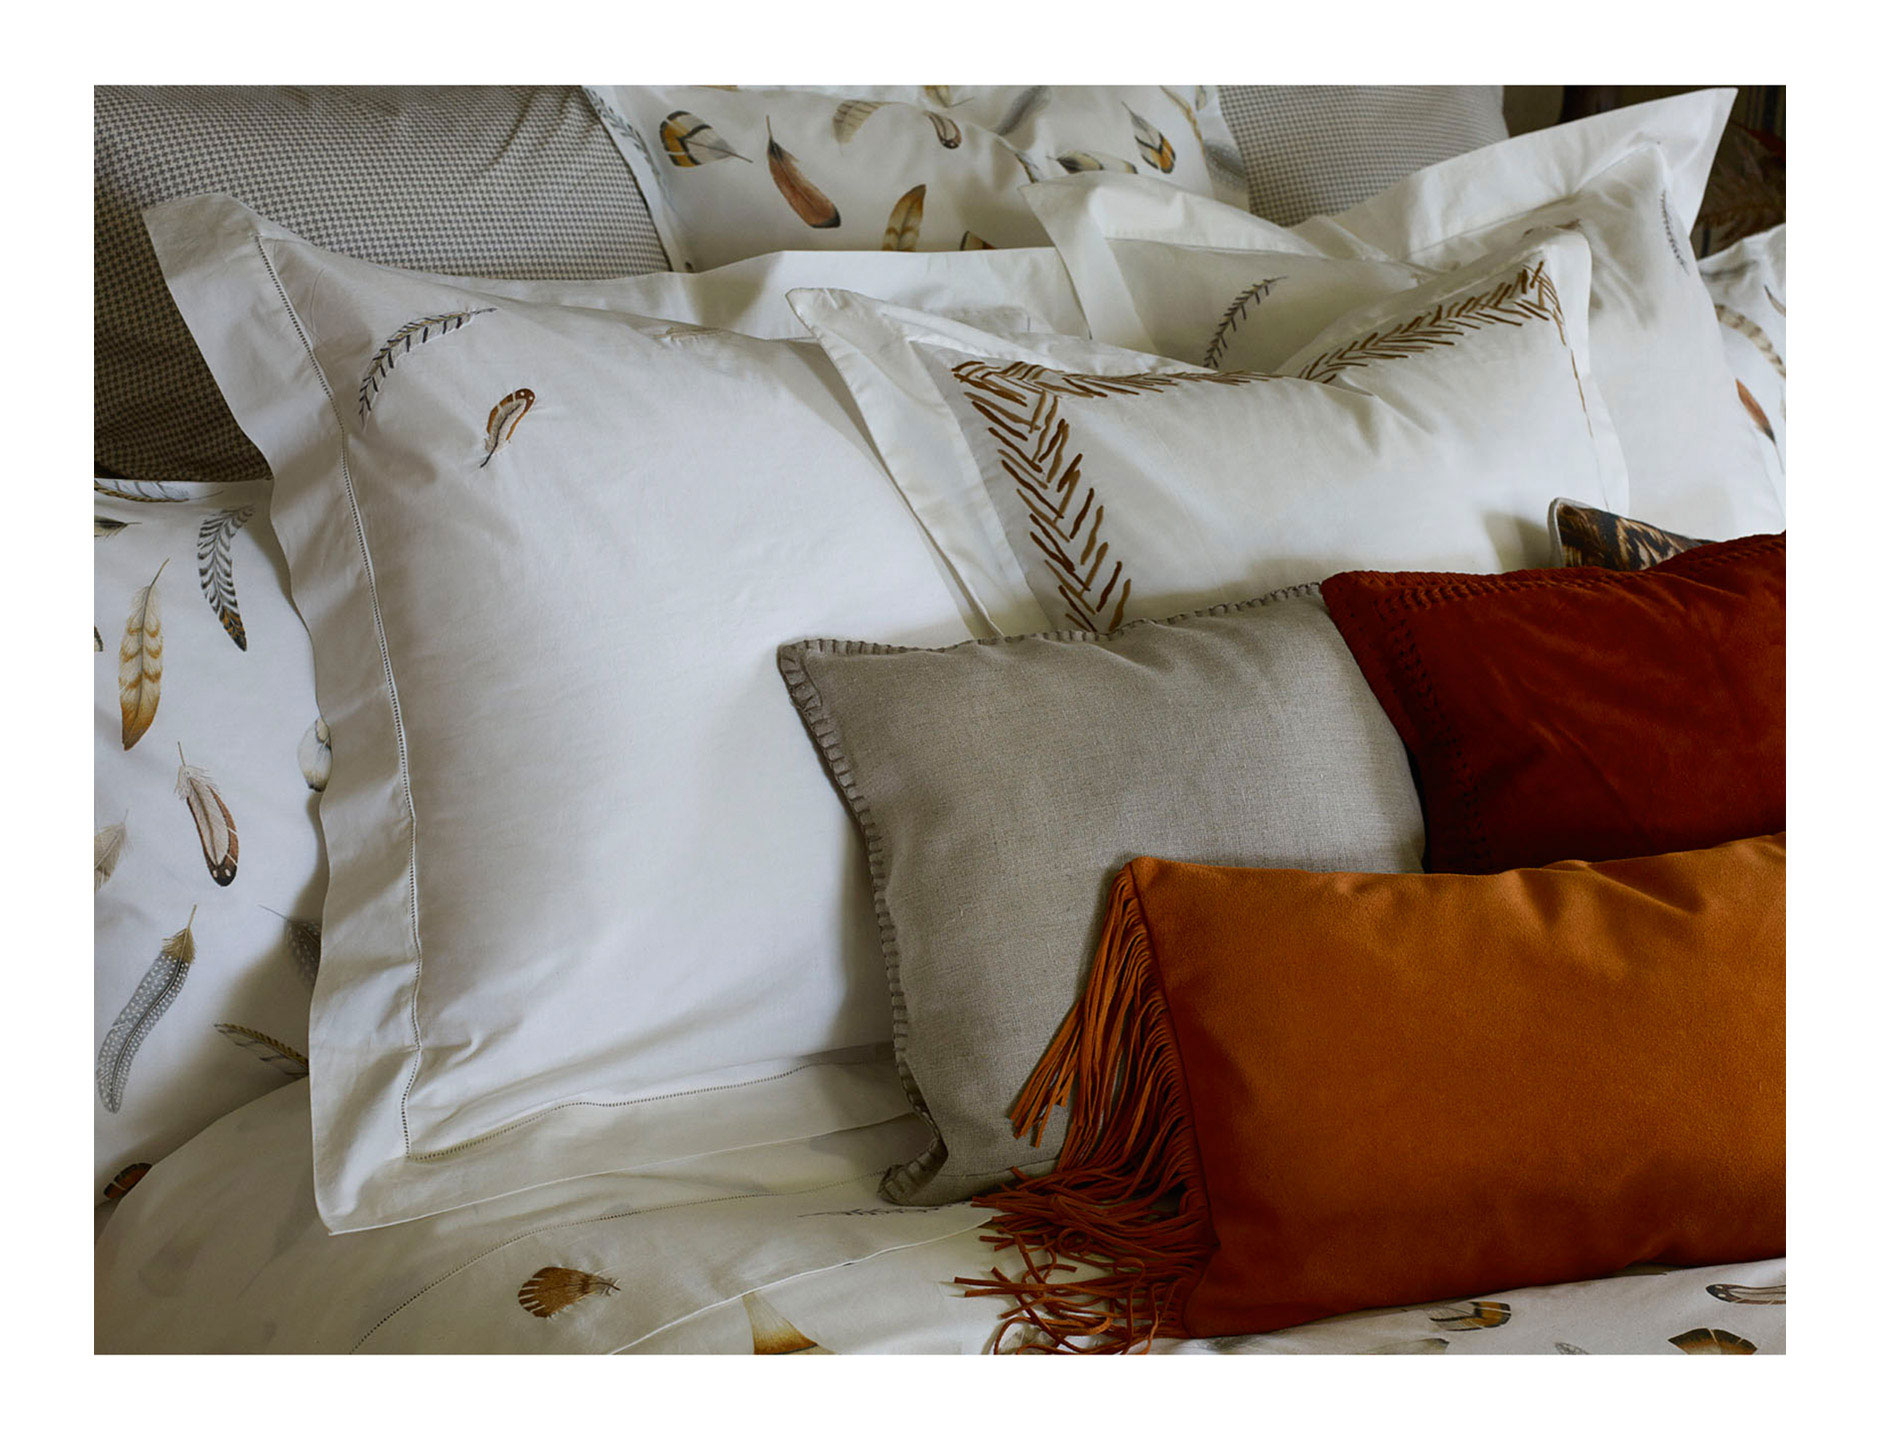 Zara home kids nueva coleccin bed mattress sale - Zara home ropa de cama ...